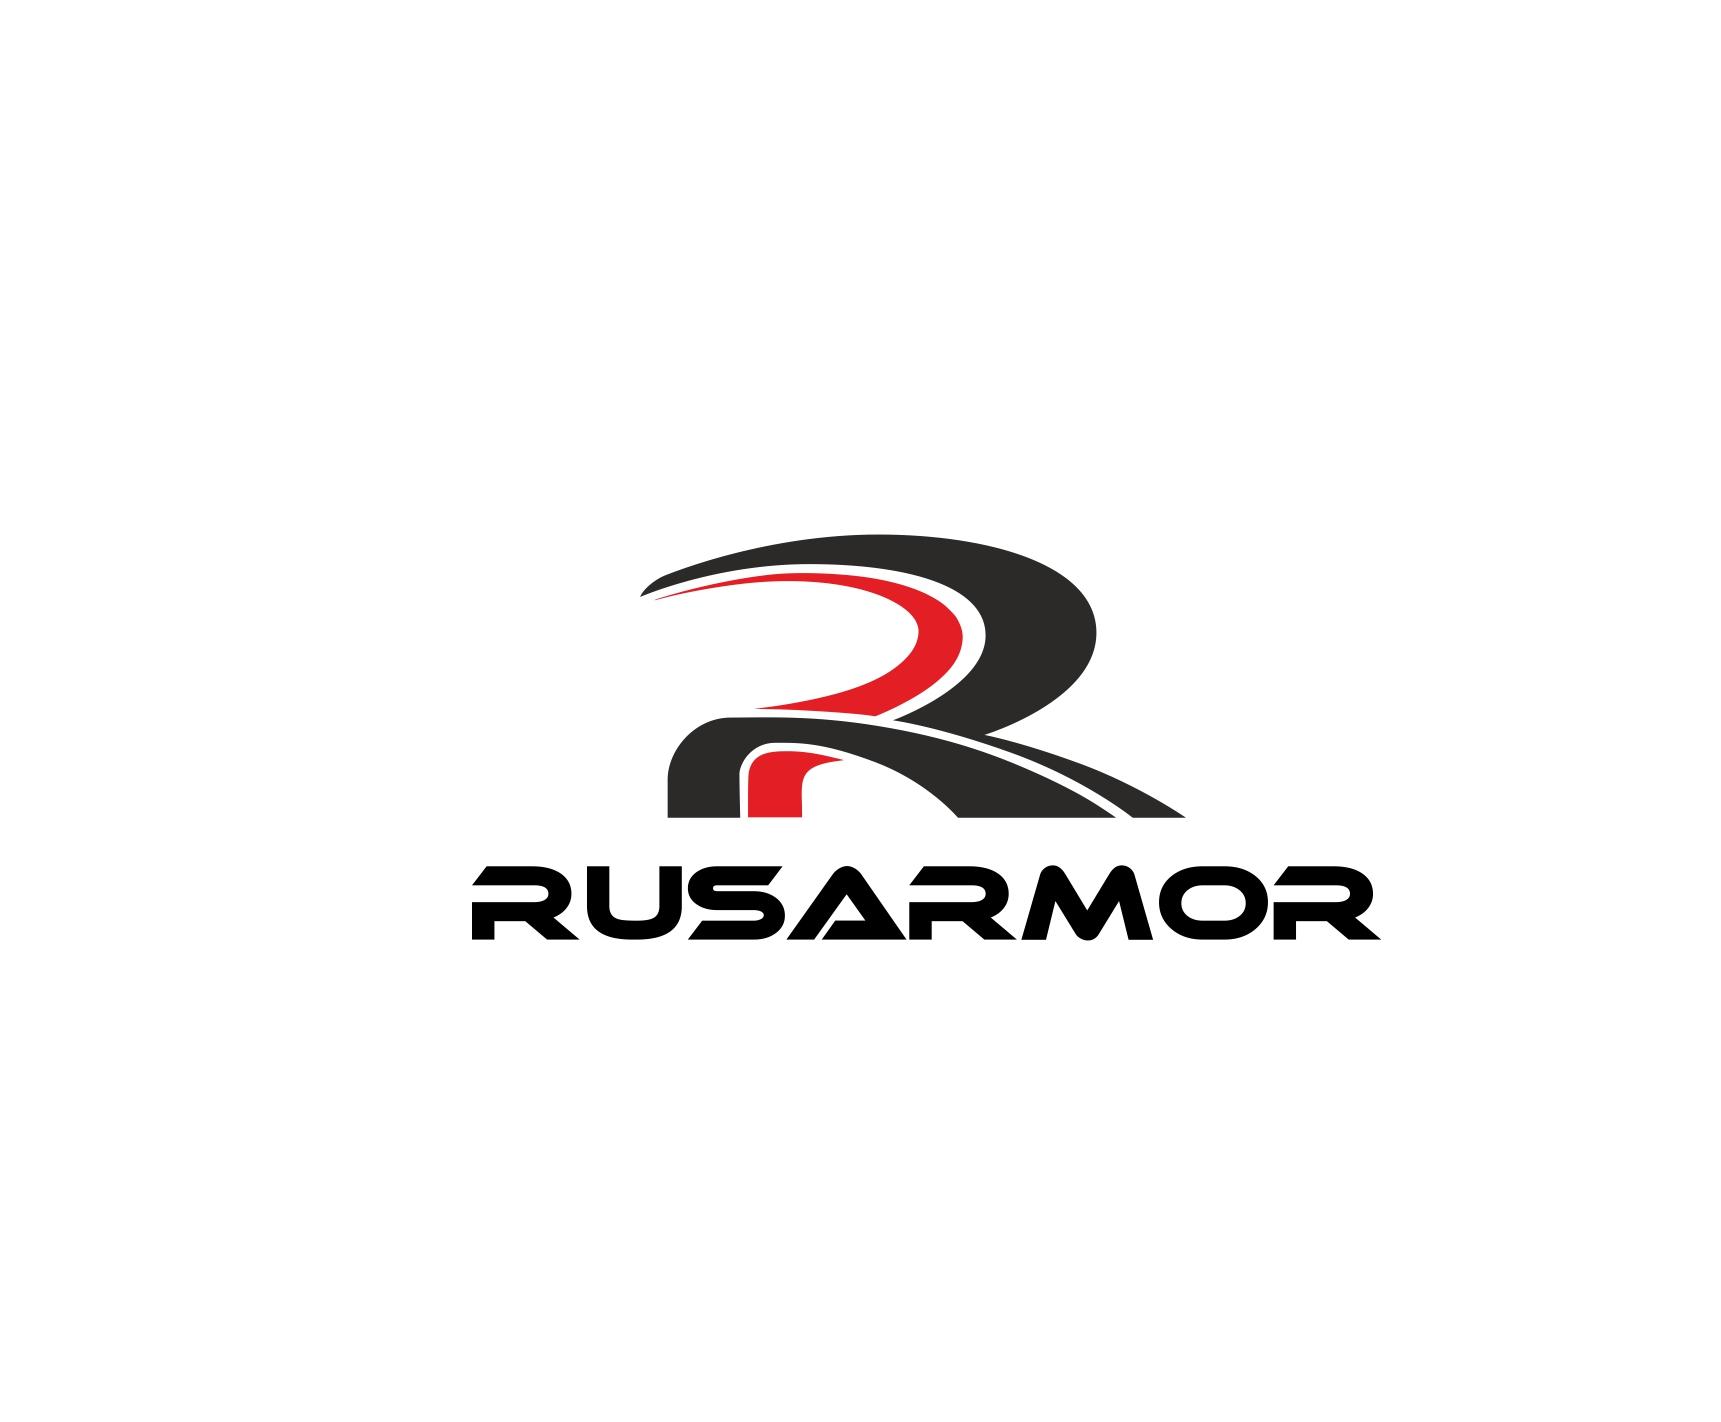 Разработка логотипа технологического стартапа РУСАРМОР фото f_8625a06ac3522ec7.jpg